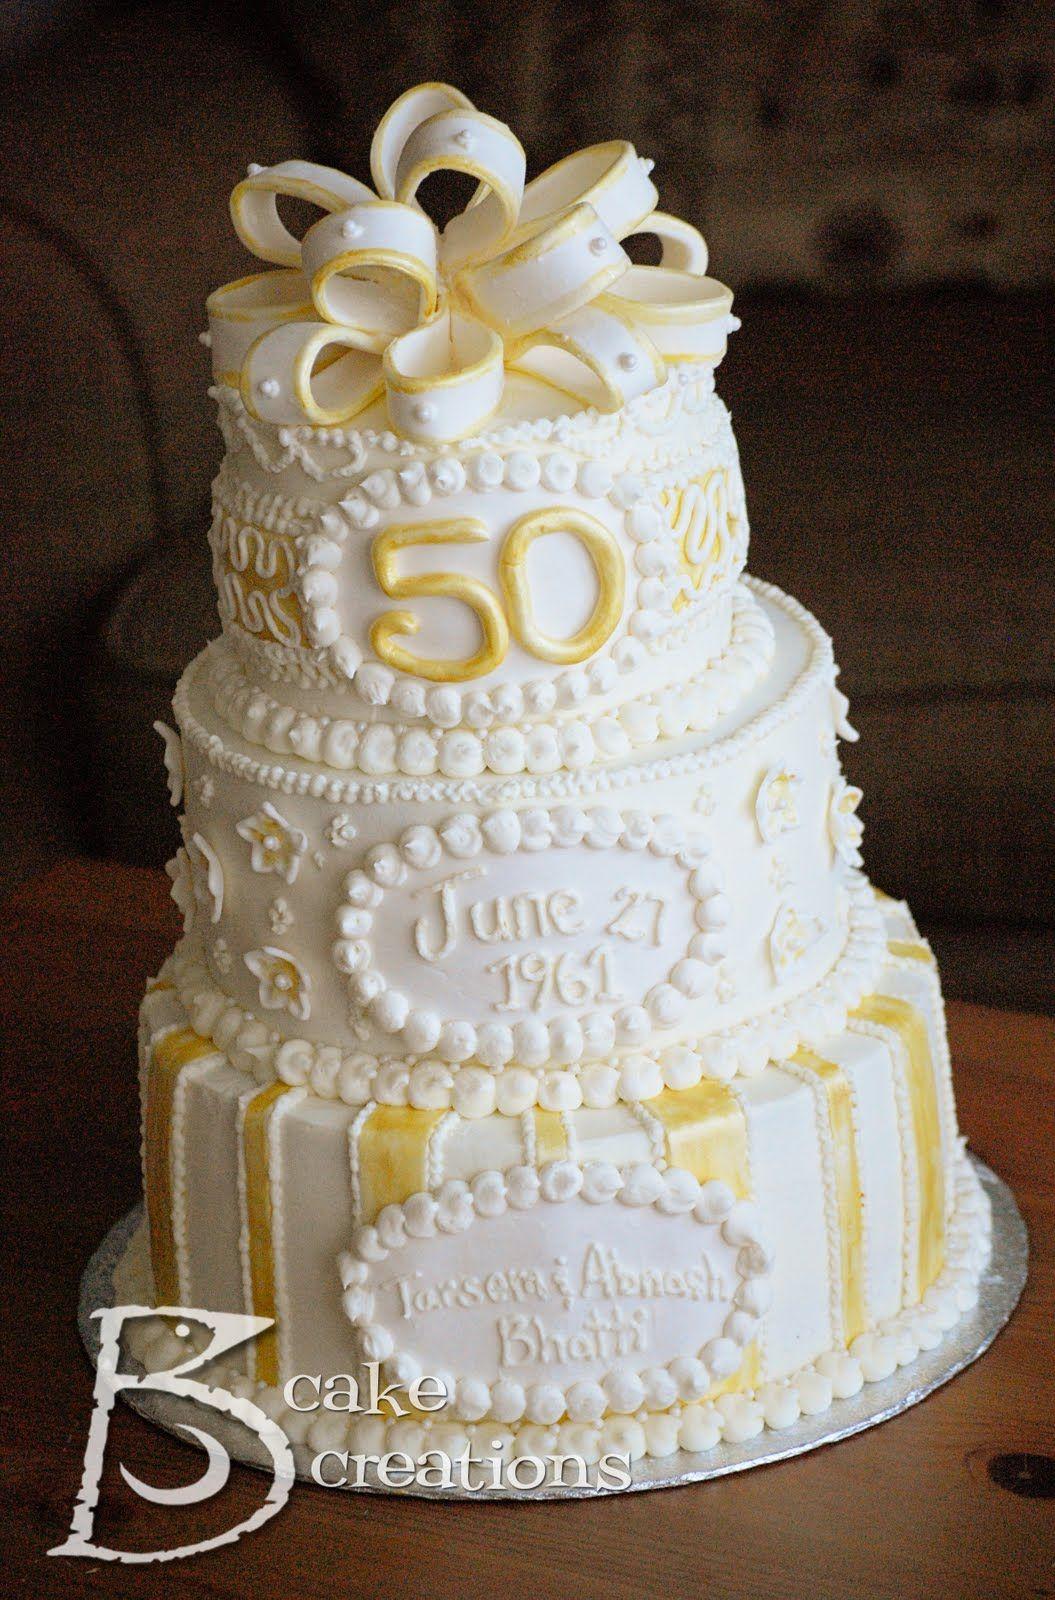 Creations Cake Decorating Golden 50th Wedding Anniversary | 50th ...